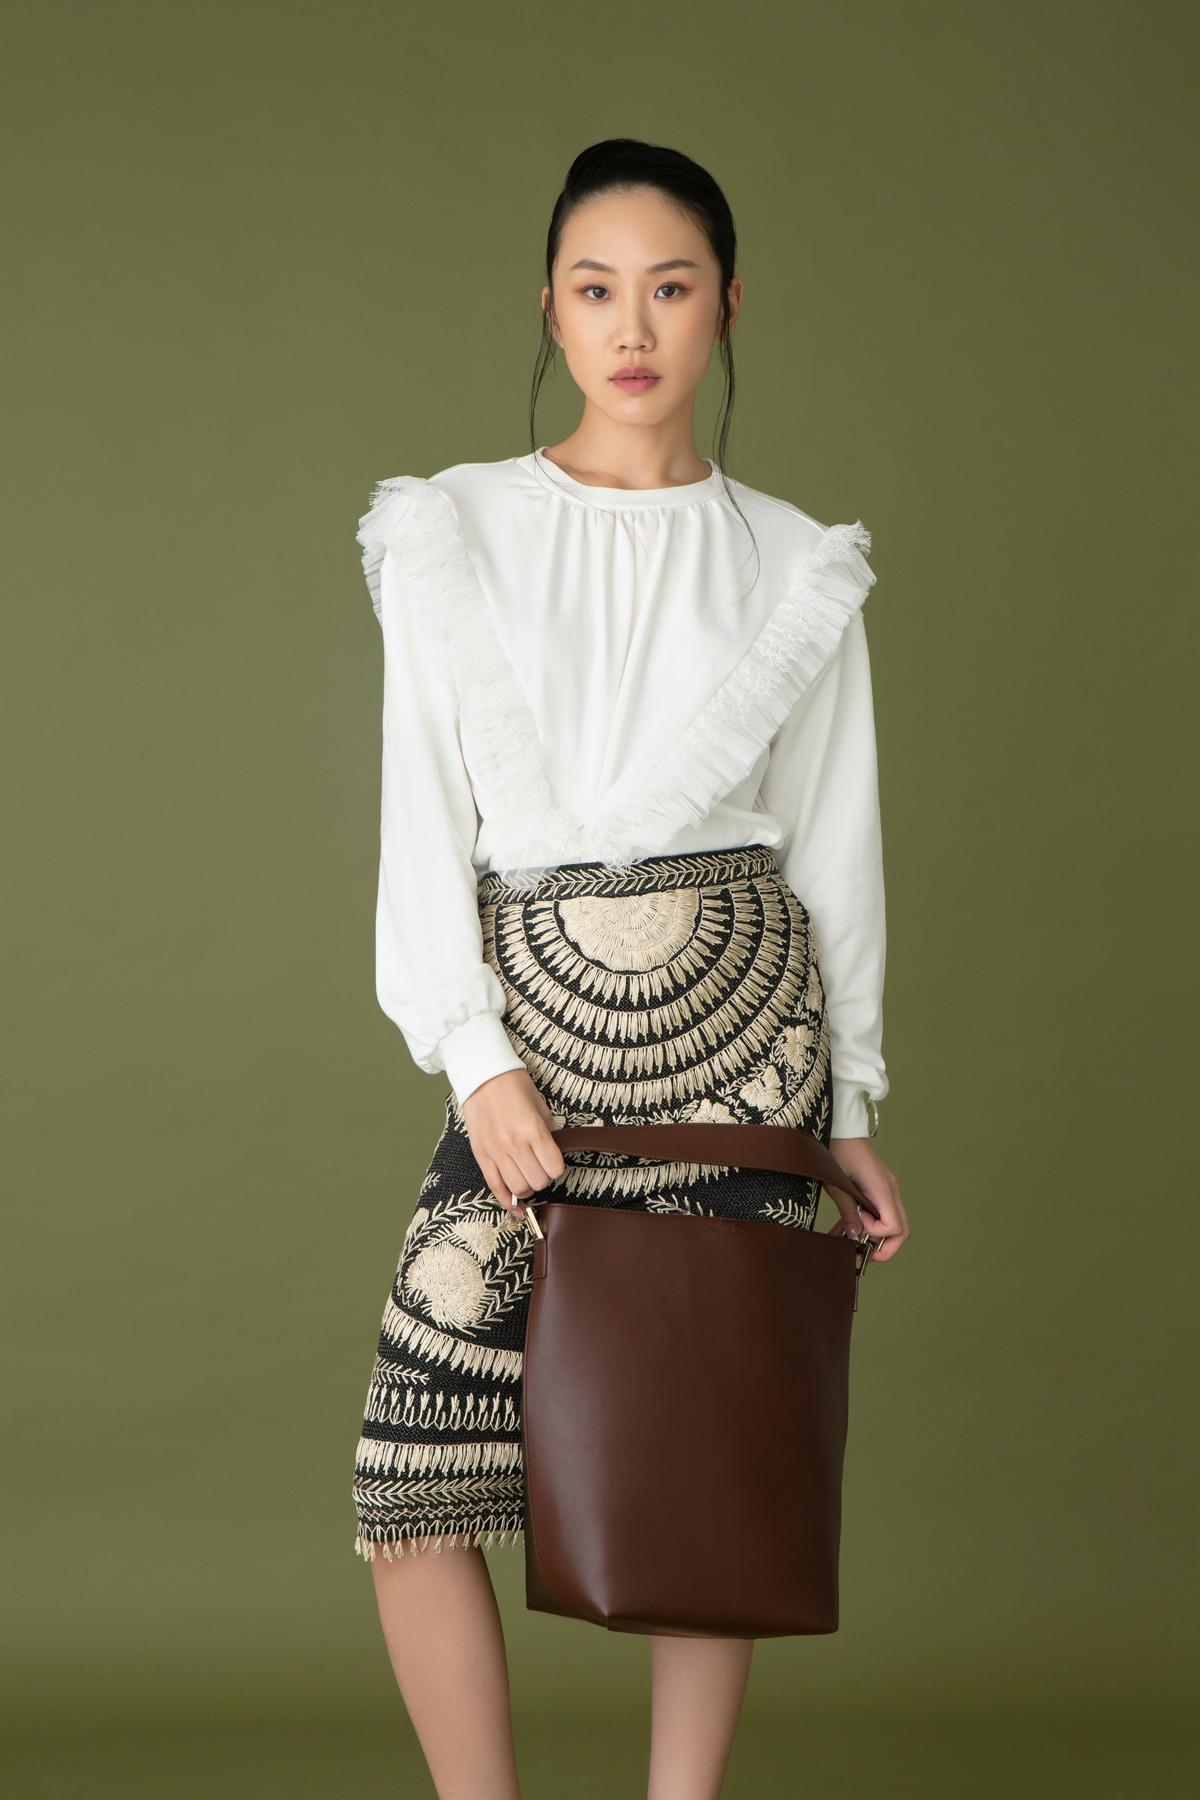 Act N1 x Marella white ruffles top $2,280  Ralph Lauren embroidery skirt $16,300 Penny Black buckle bag $1,480